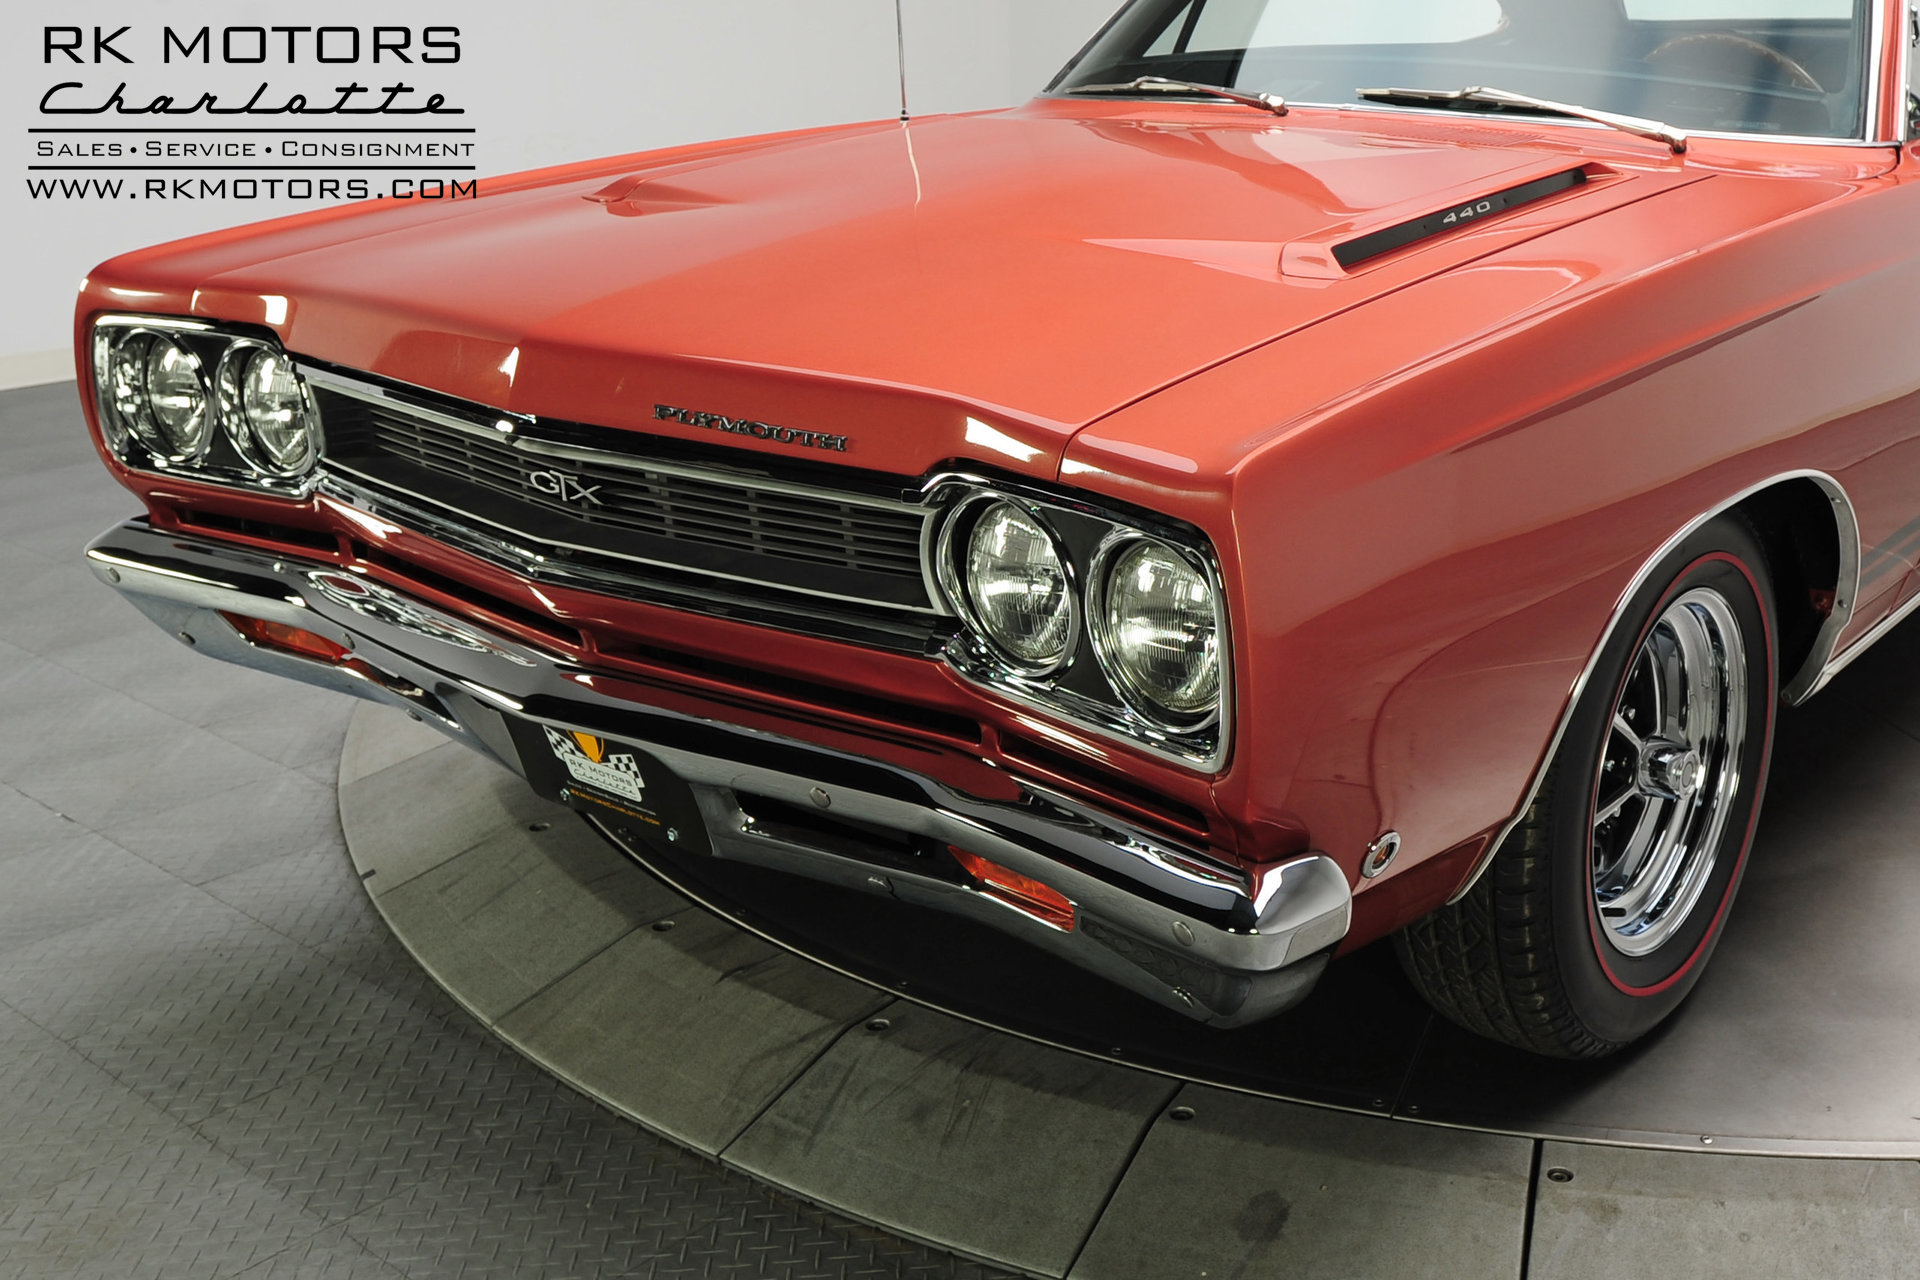 132877 1968 plymouth gtx rk motors classic and performance cars rh rkmotors com